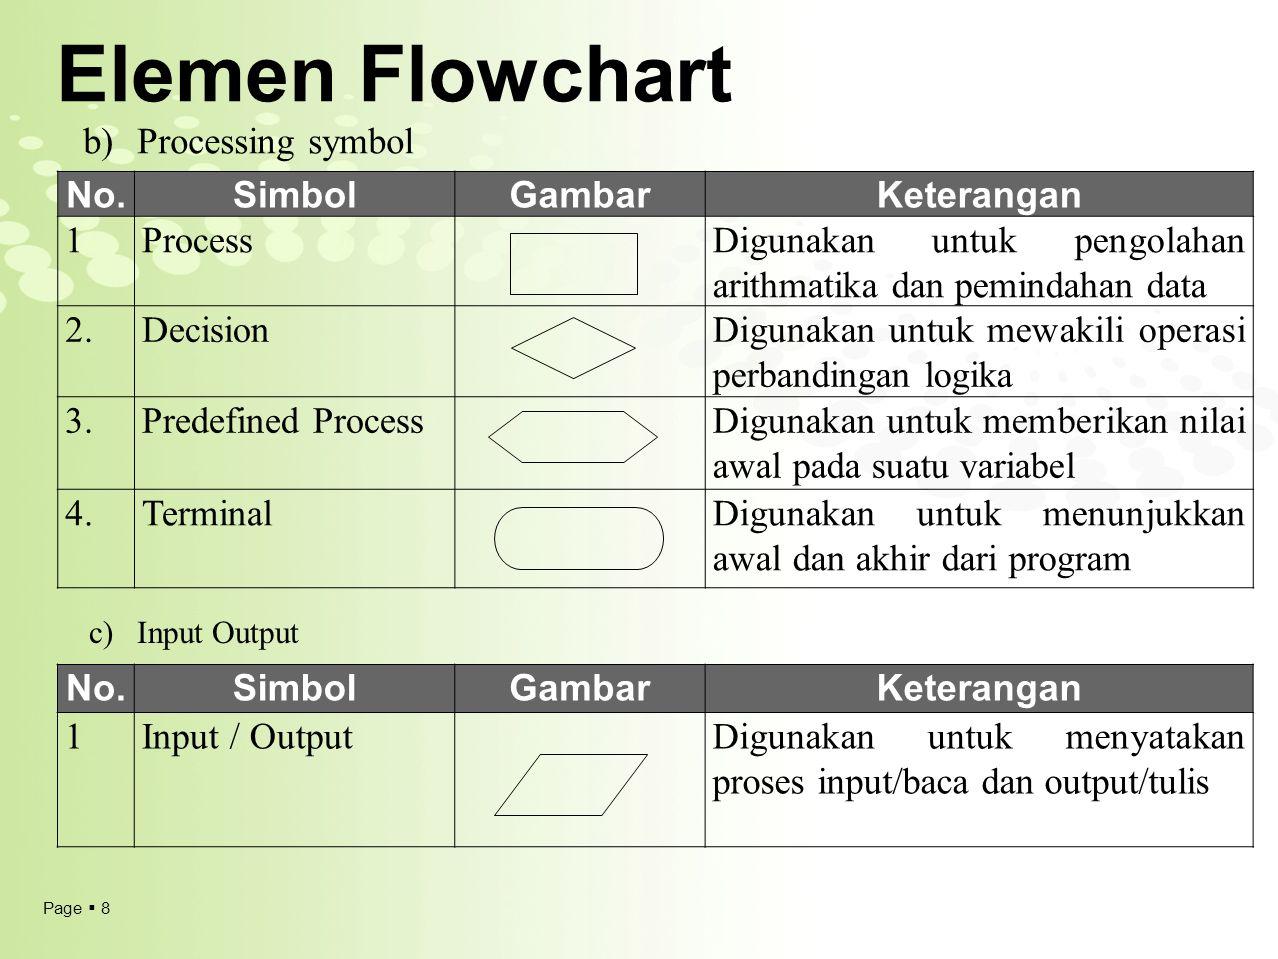 Elemen Flowchart Processing symbol No. Simbol Gambar Keterangan 1